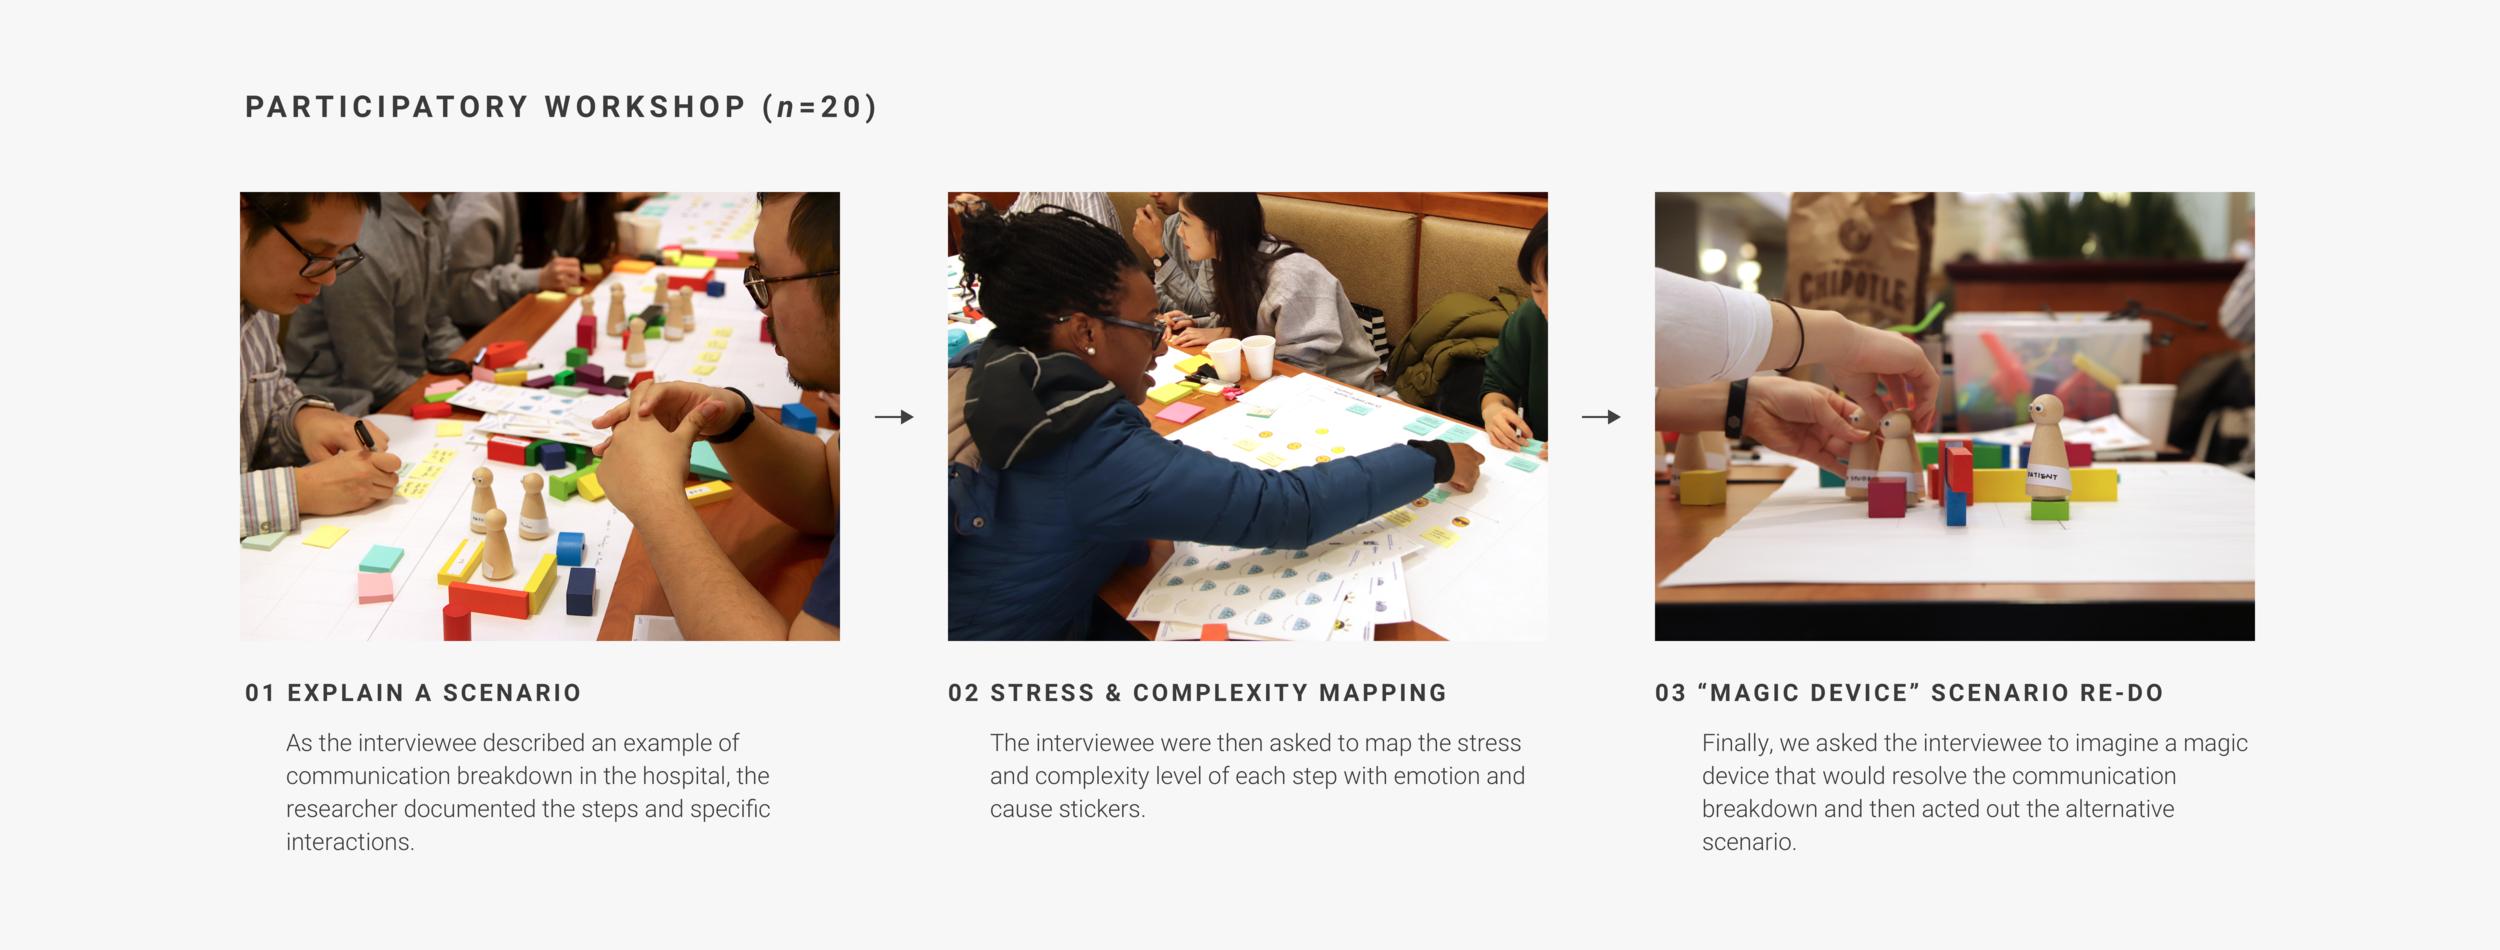 03-2+partipatory+workshop+step.png